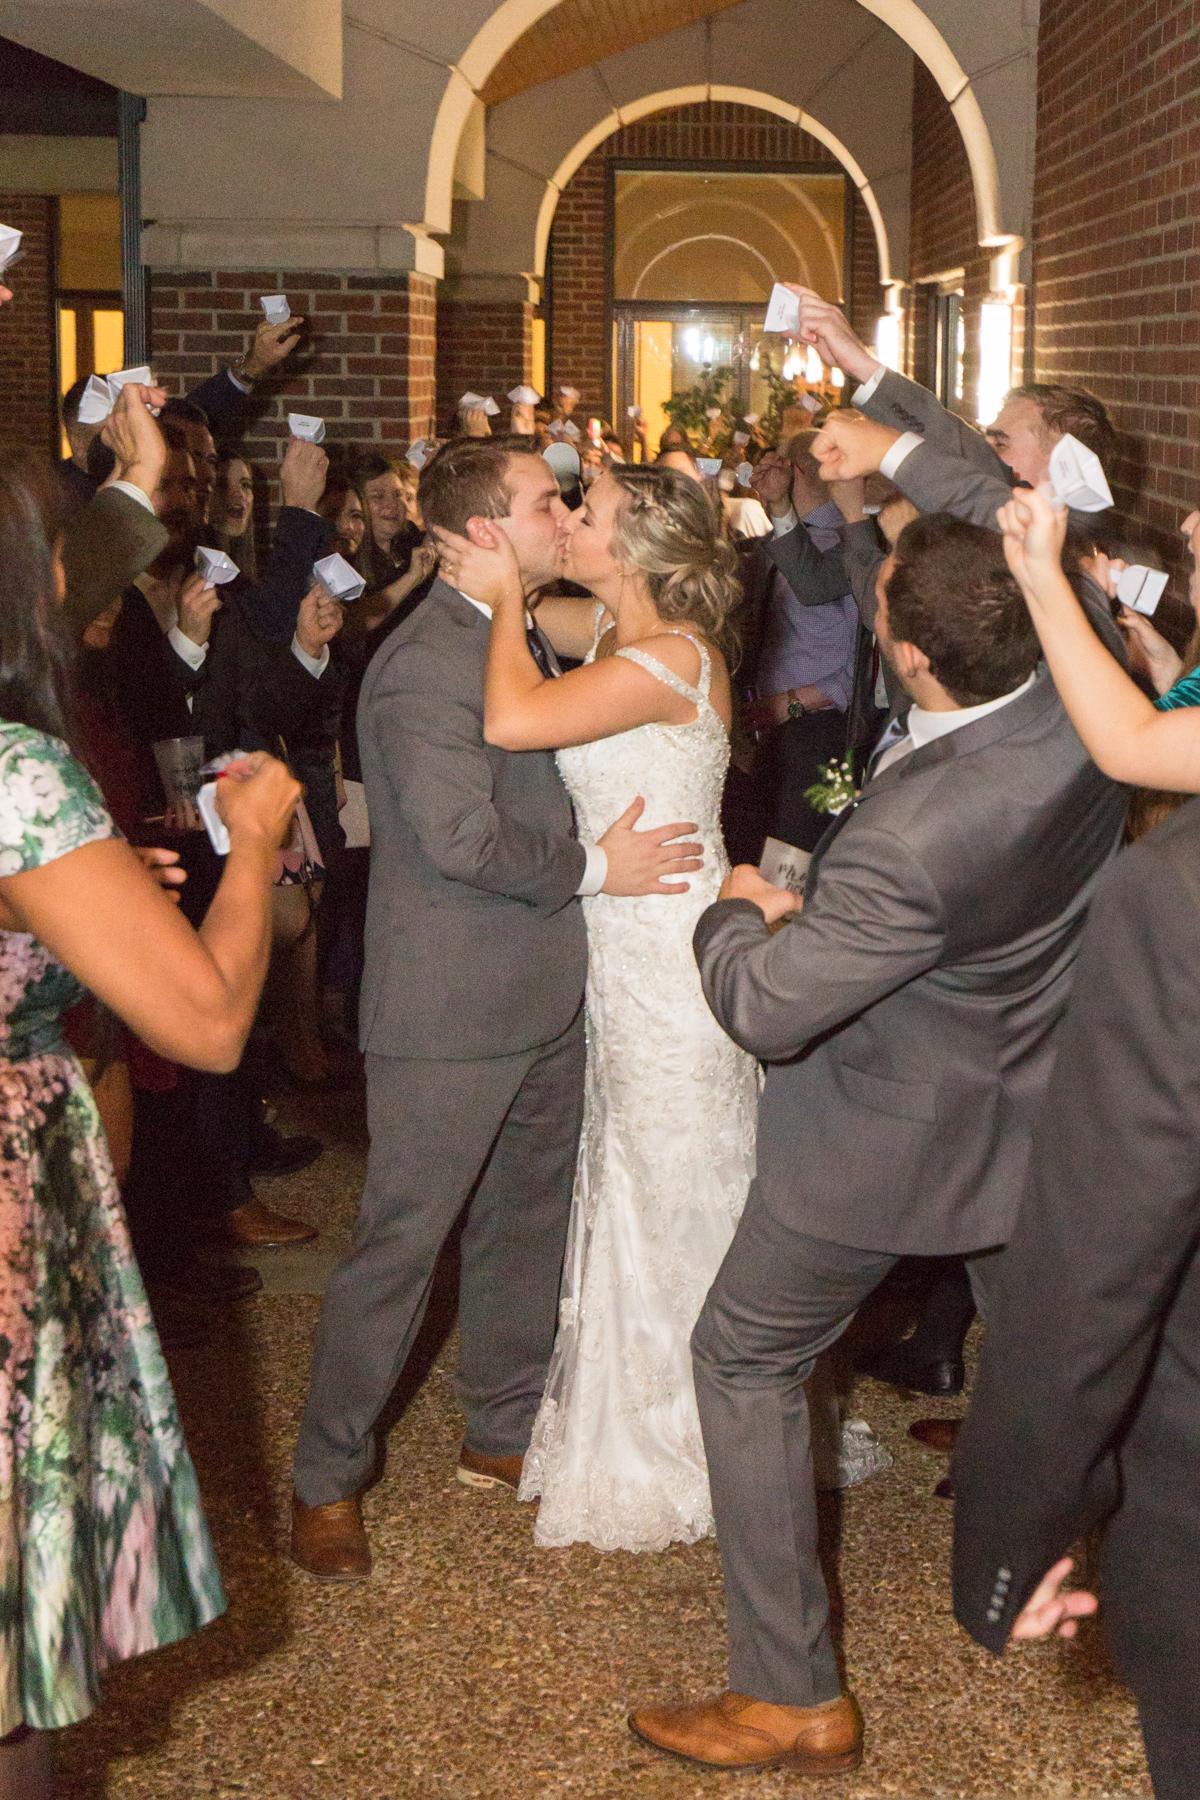 Kelli-and-Matt-Nashville-Wedding-Sneak-Peak-0320.jpg